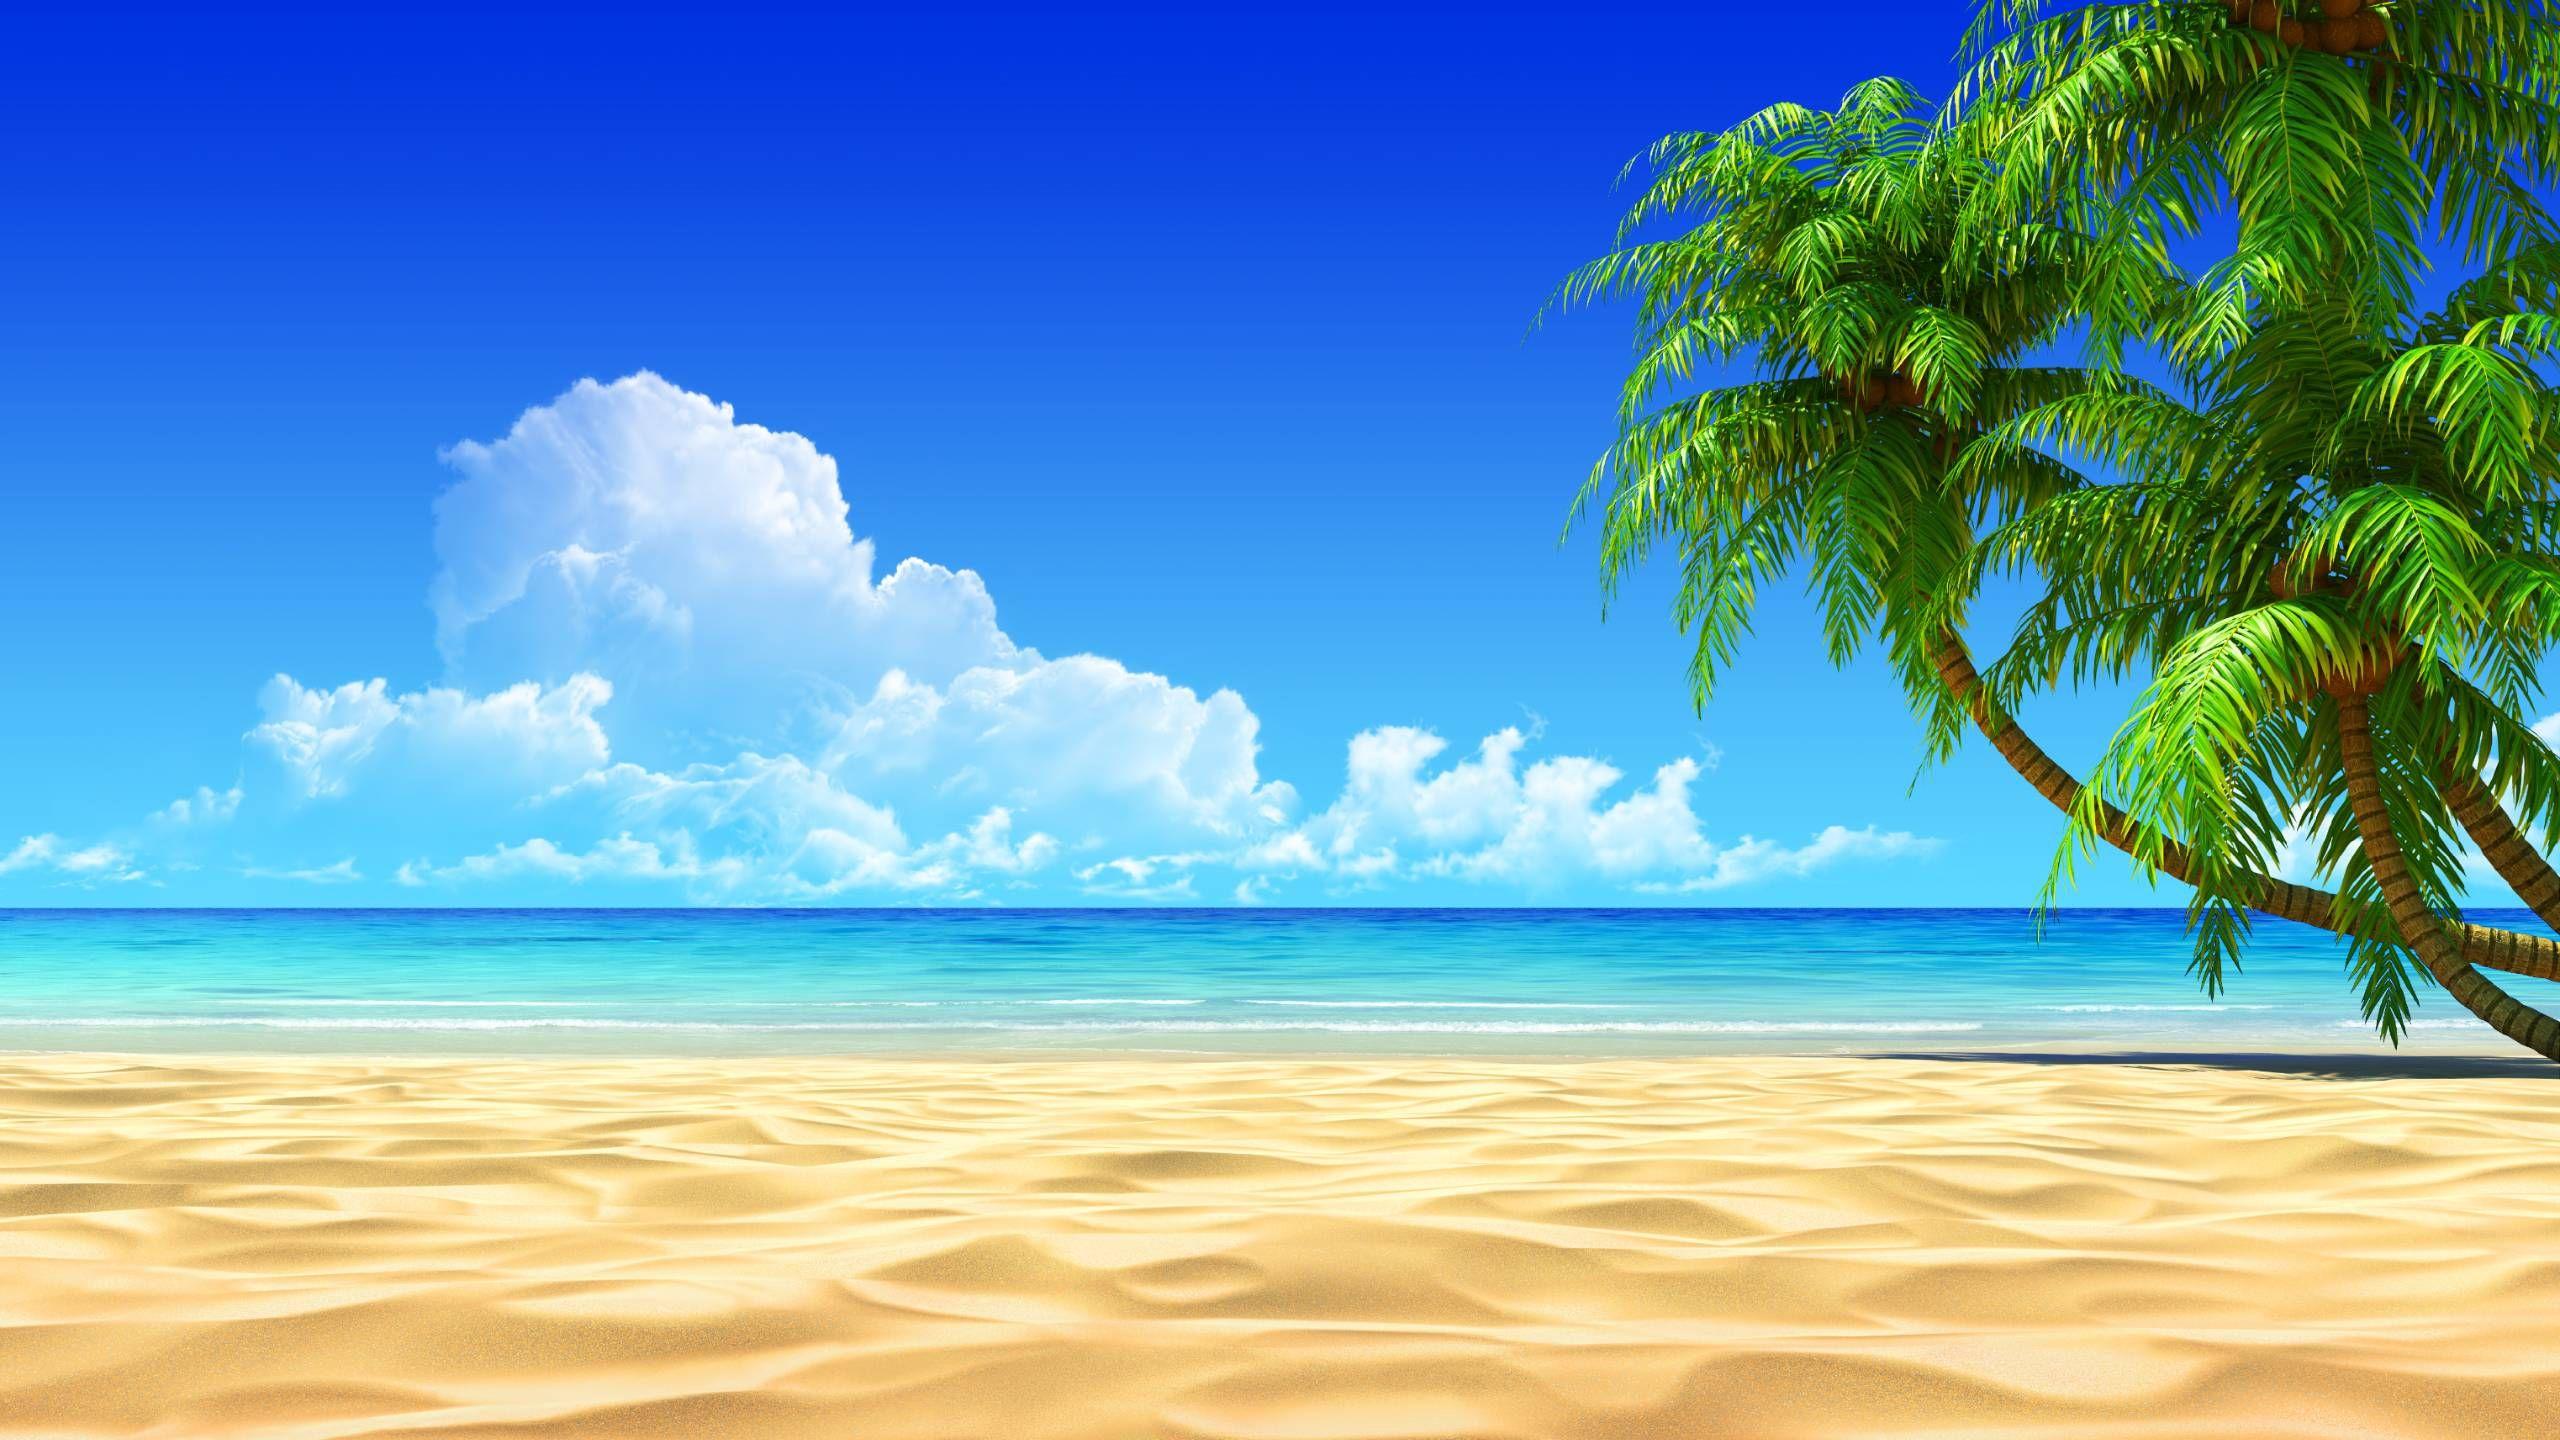 free tropical desktop backgrounds wallpaper cave